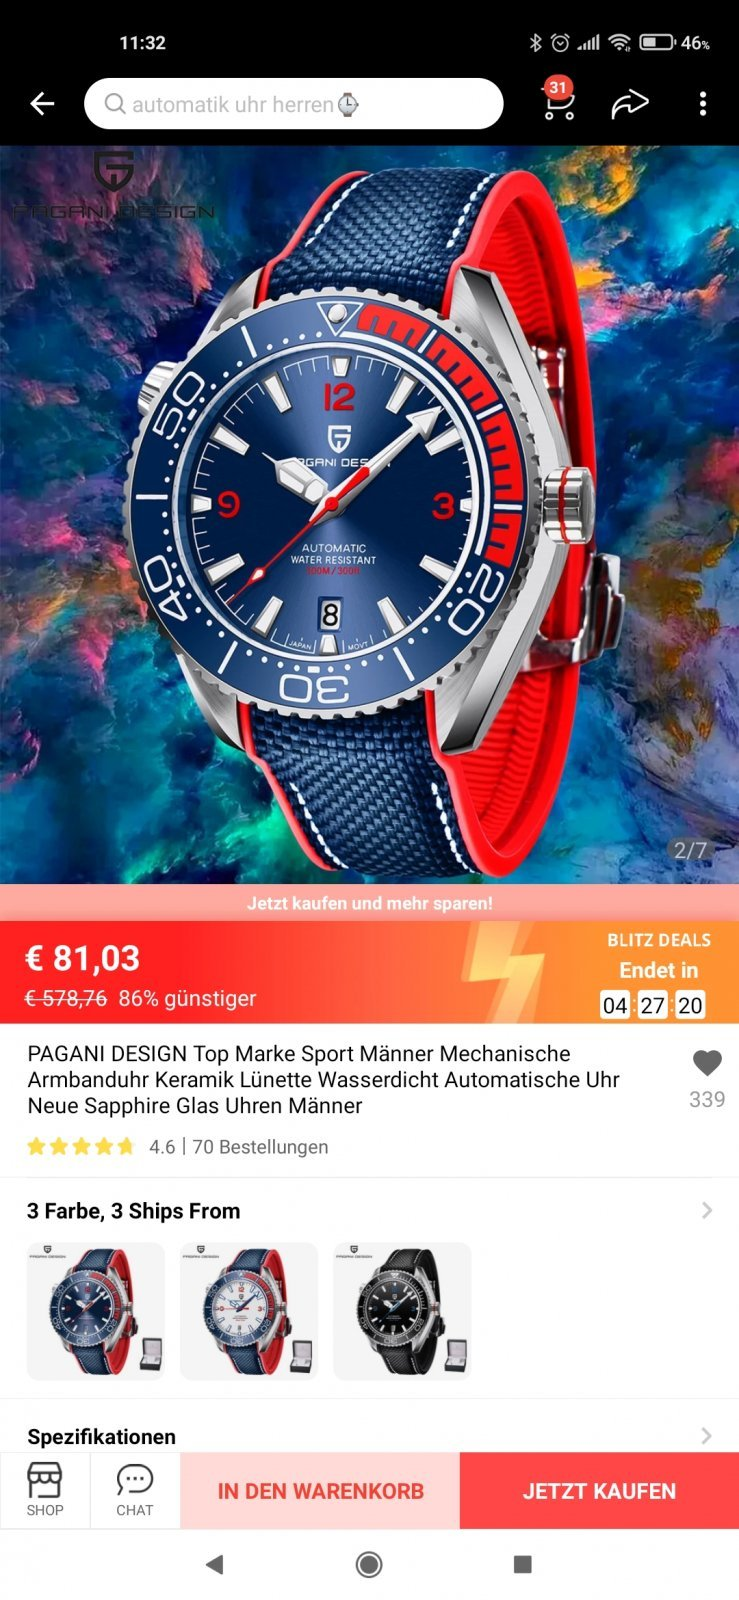 Screenshot_2021-05-31-11-32-39-205_com.alibaba.aliexpresshd.jpg